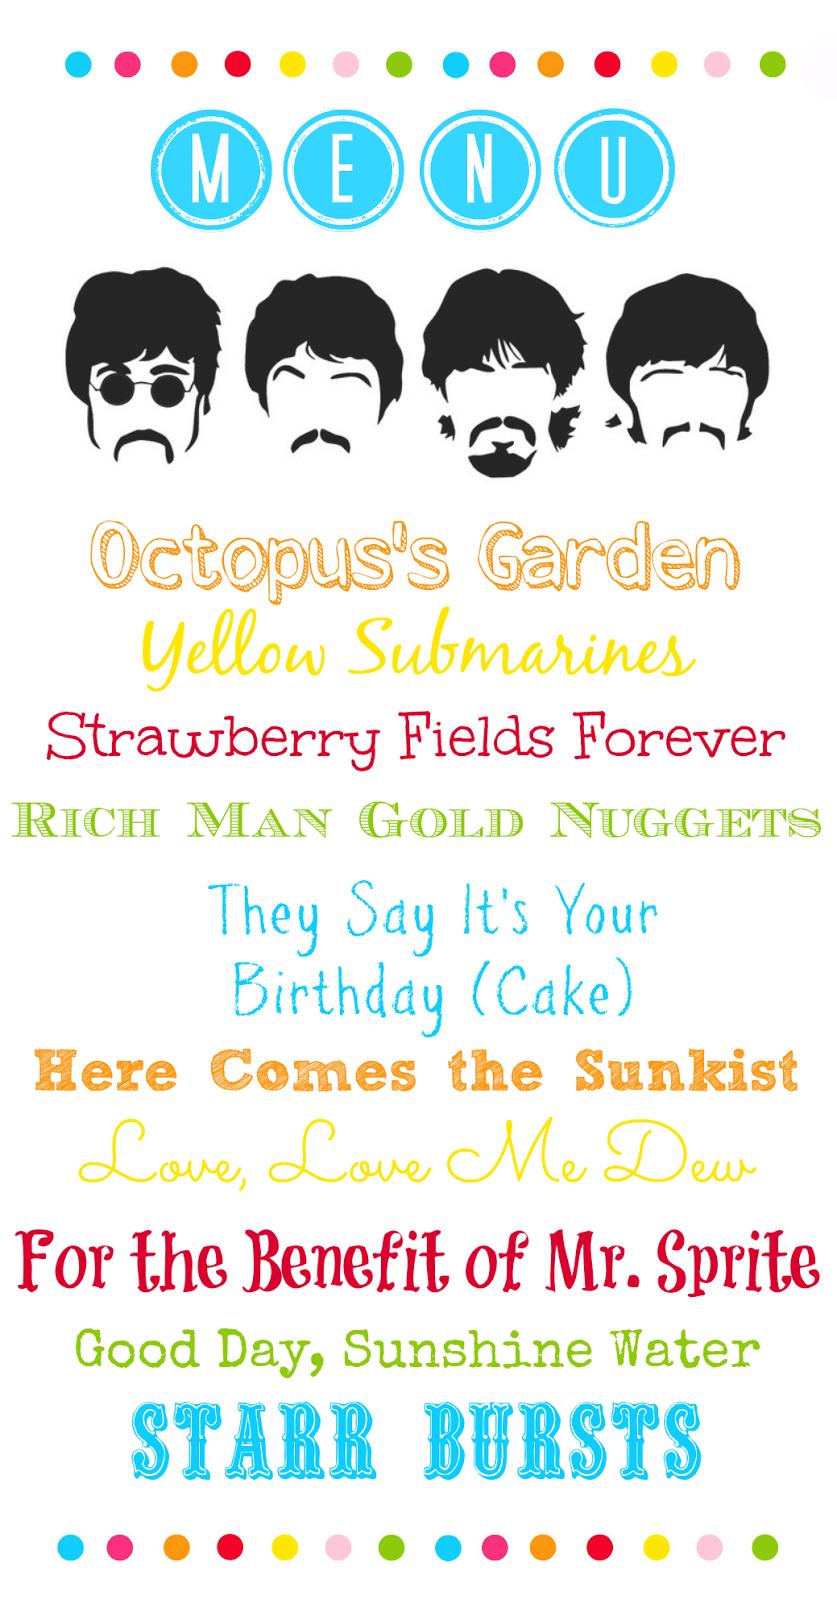 The Beatles Inspired Birthday Party Invitation